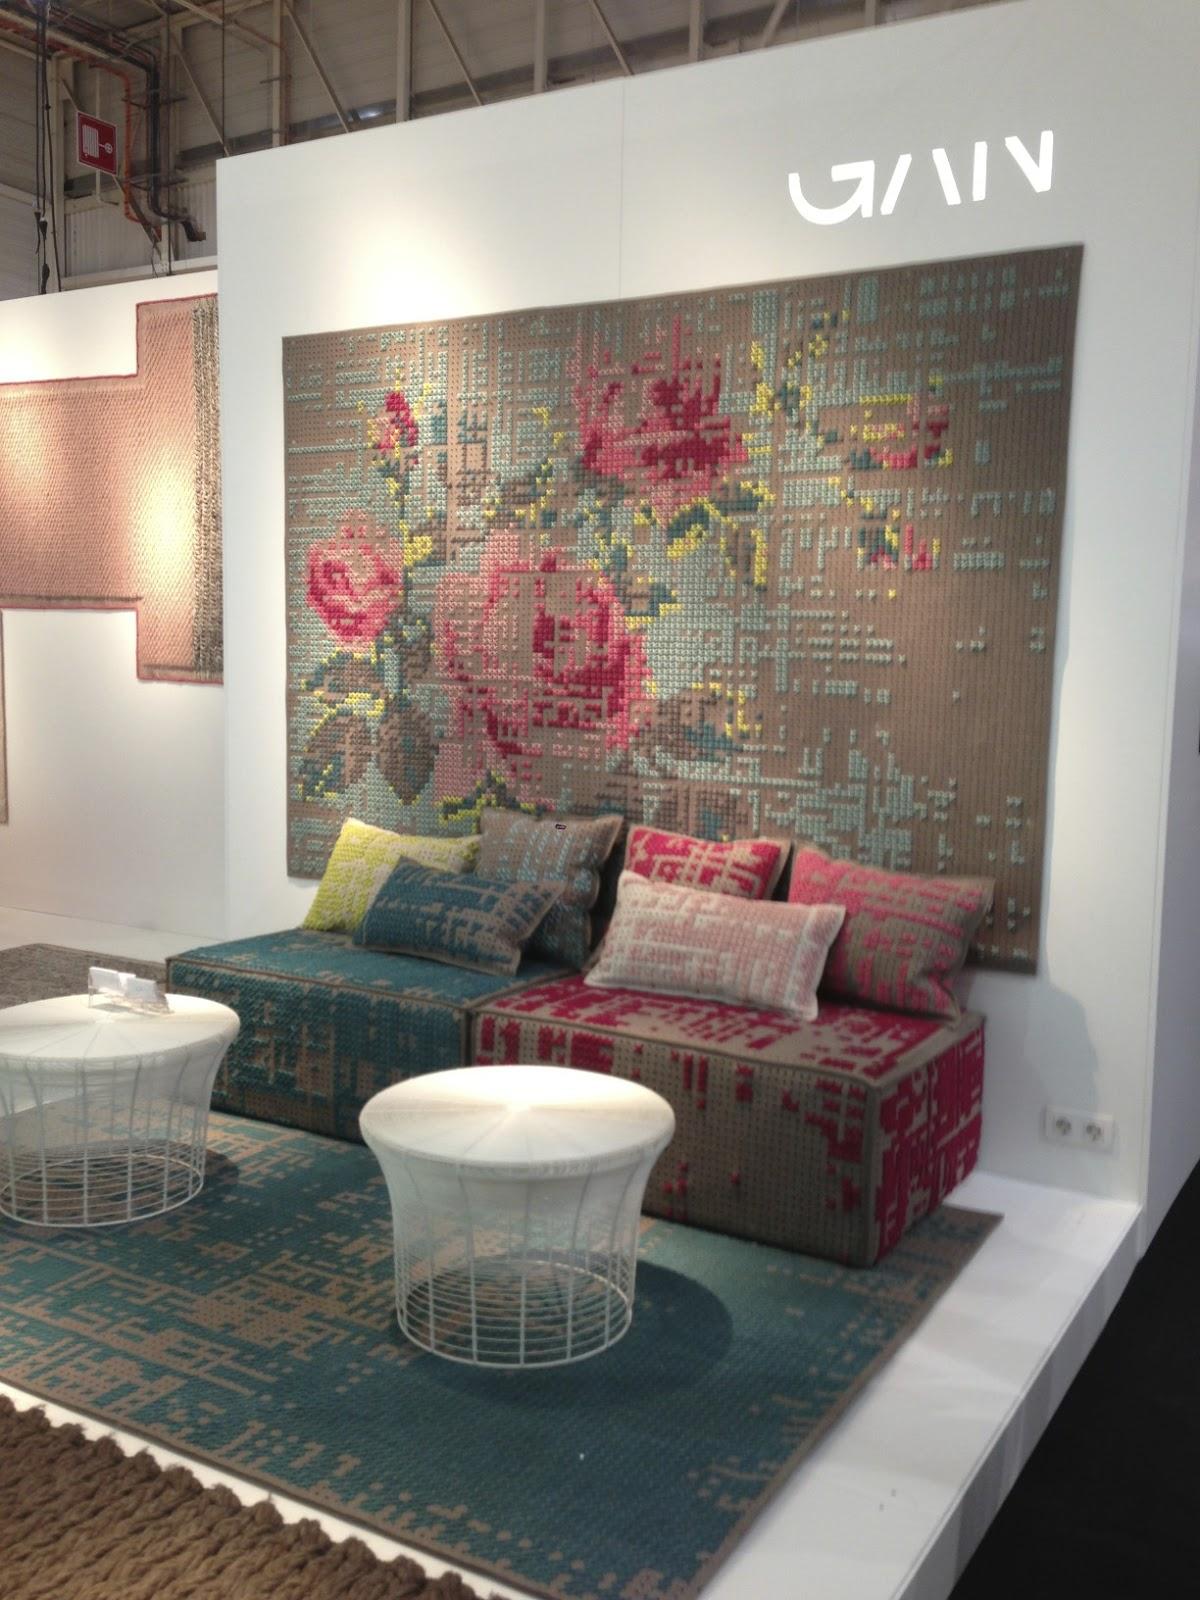 spanish sofa brand extra large recliner le blog mademoiselle pics maison et objets 2013